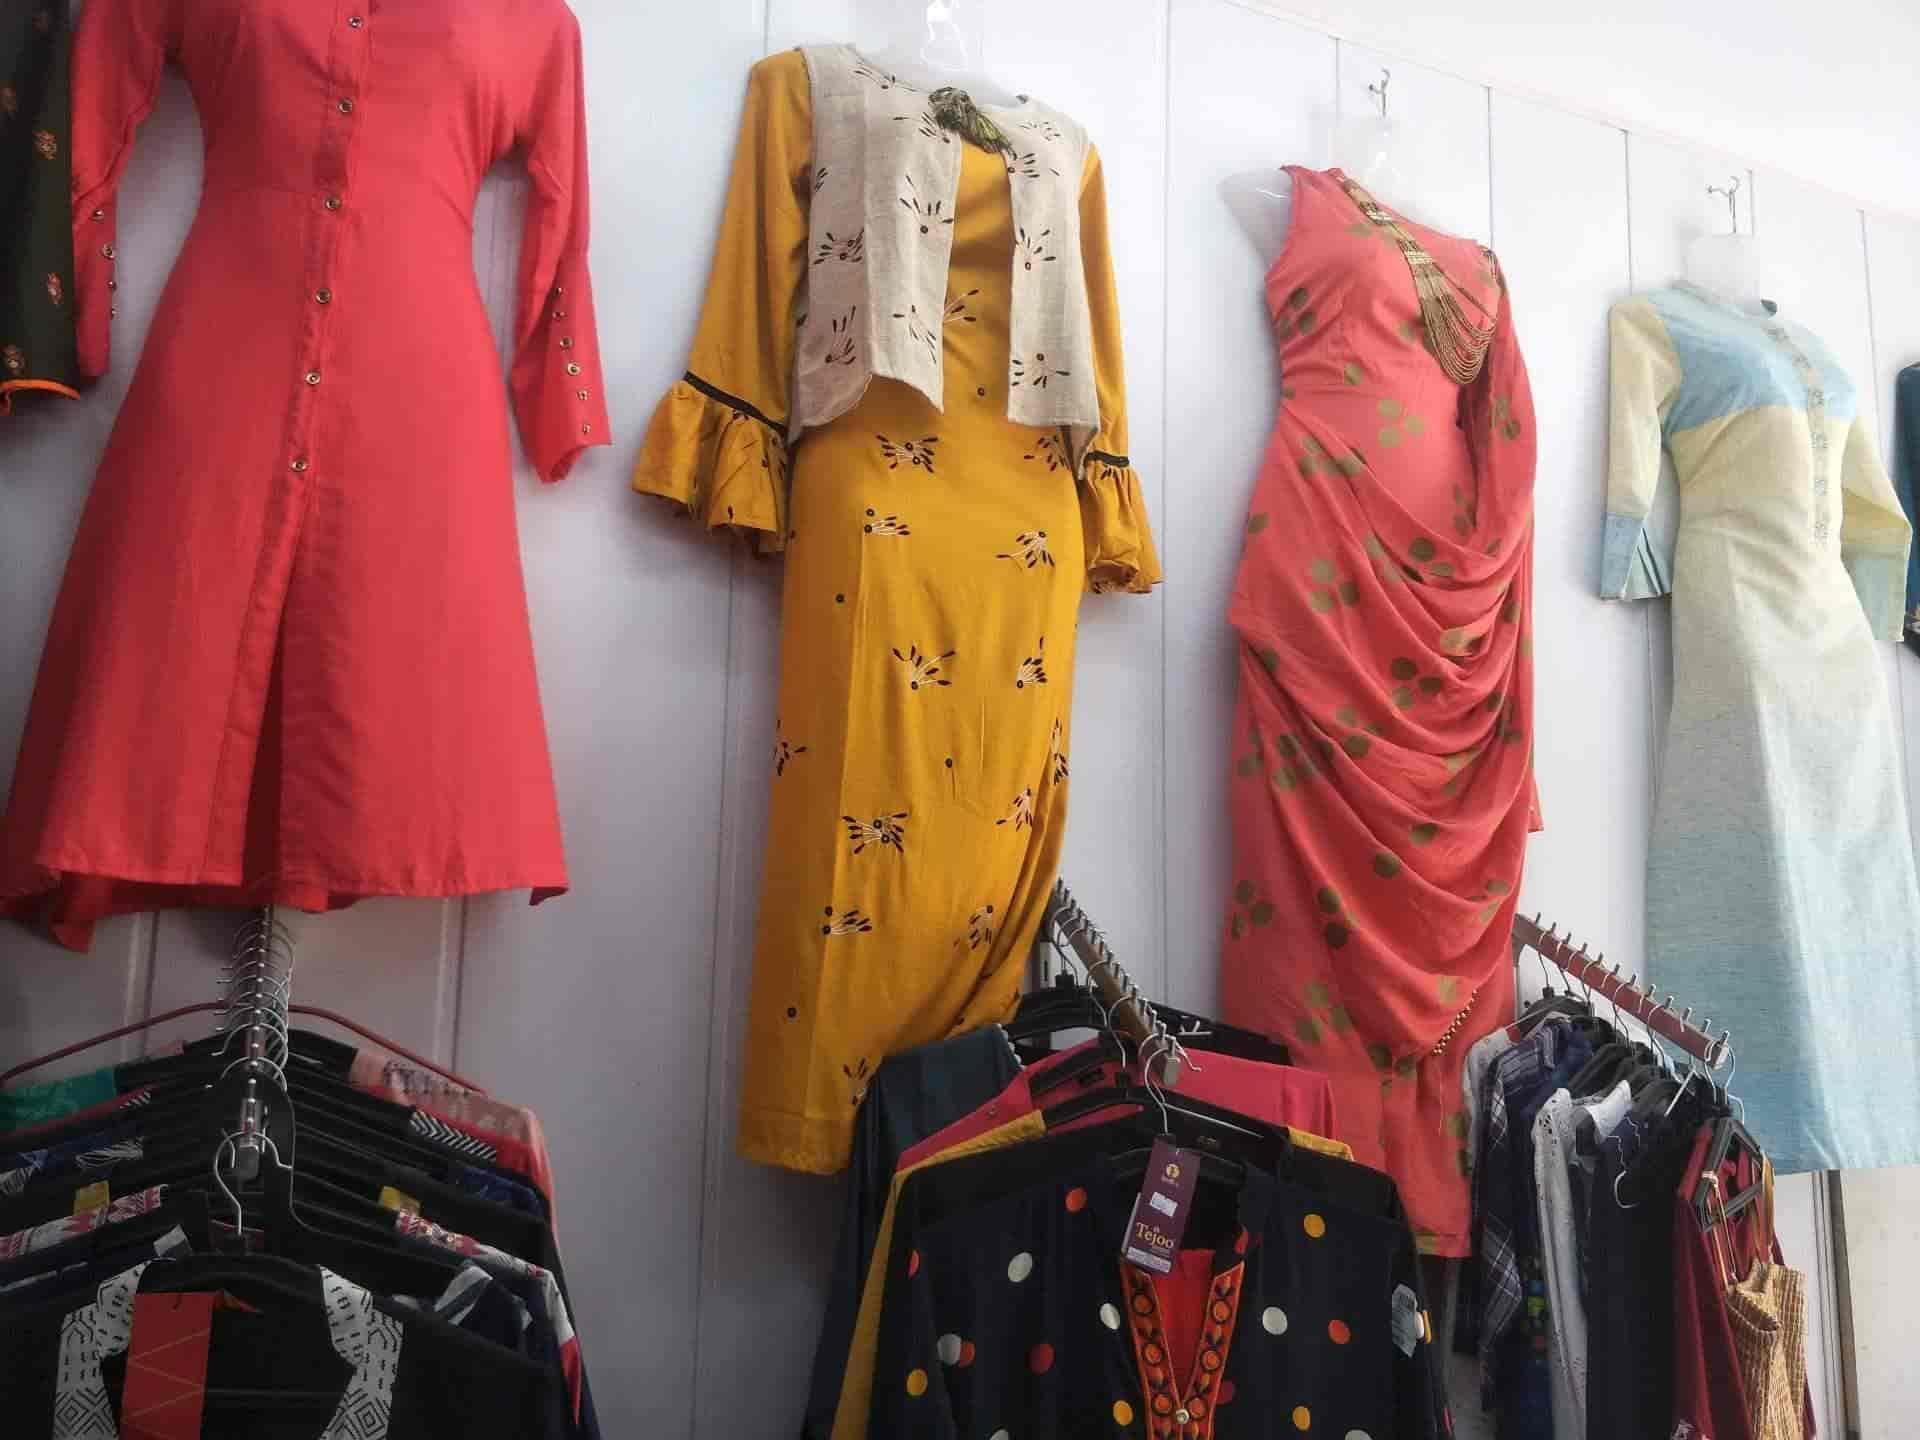 Poshak Boutique, Zira - Boutiques in ferozepur - Justdial